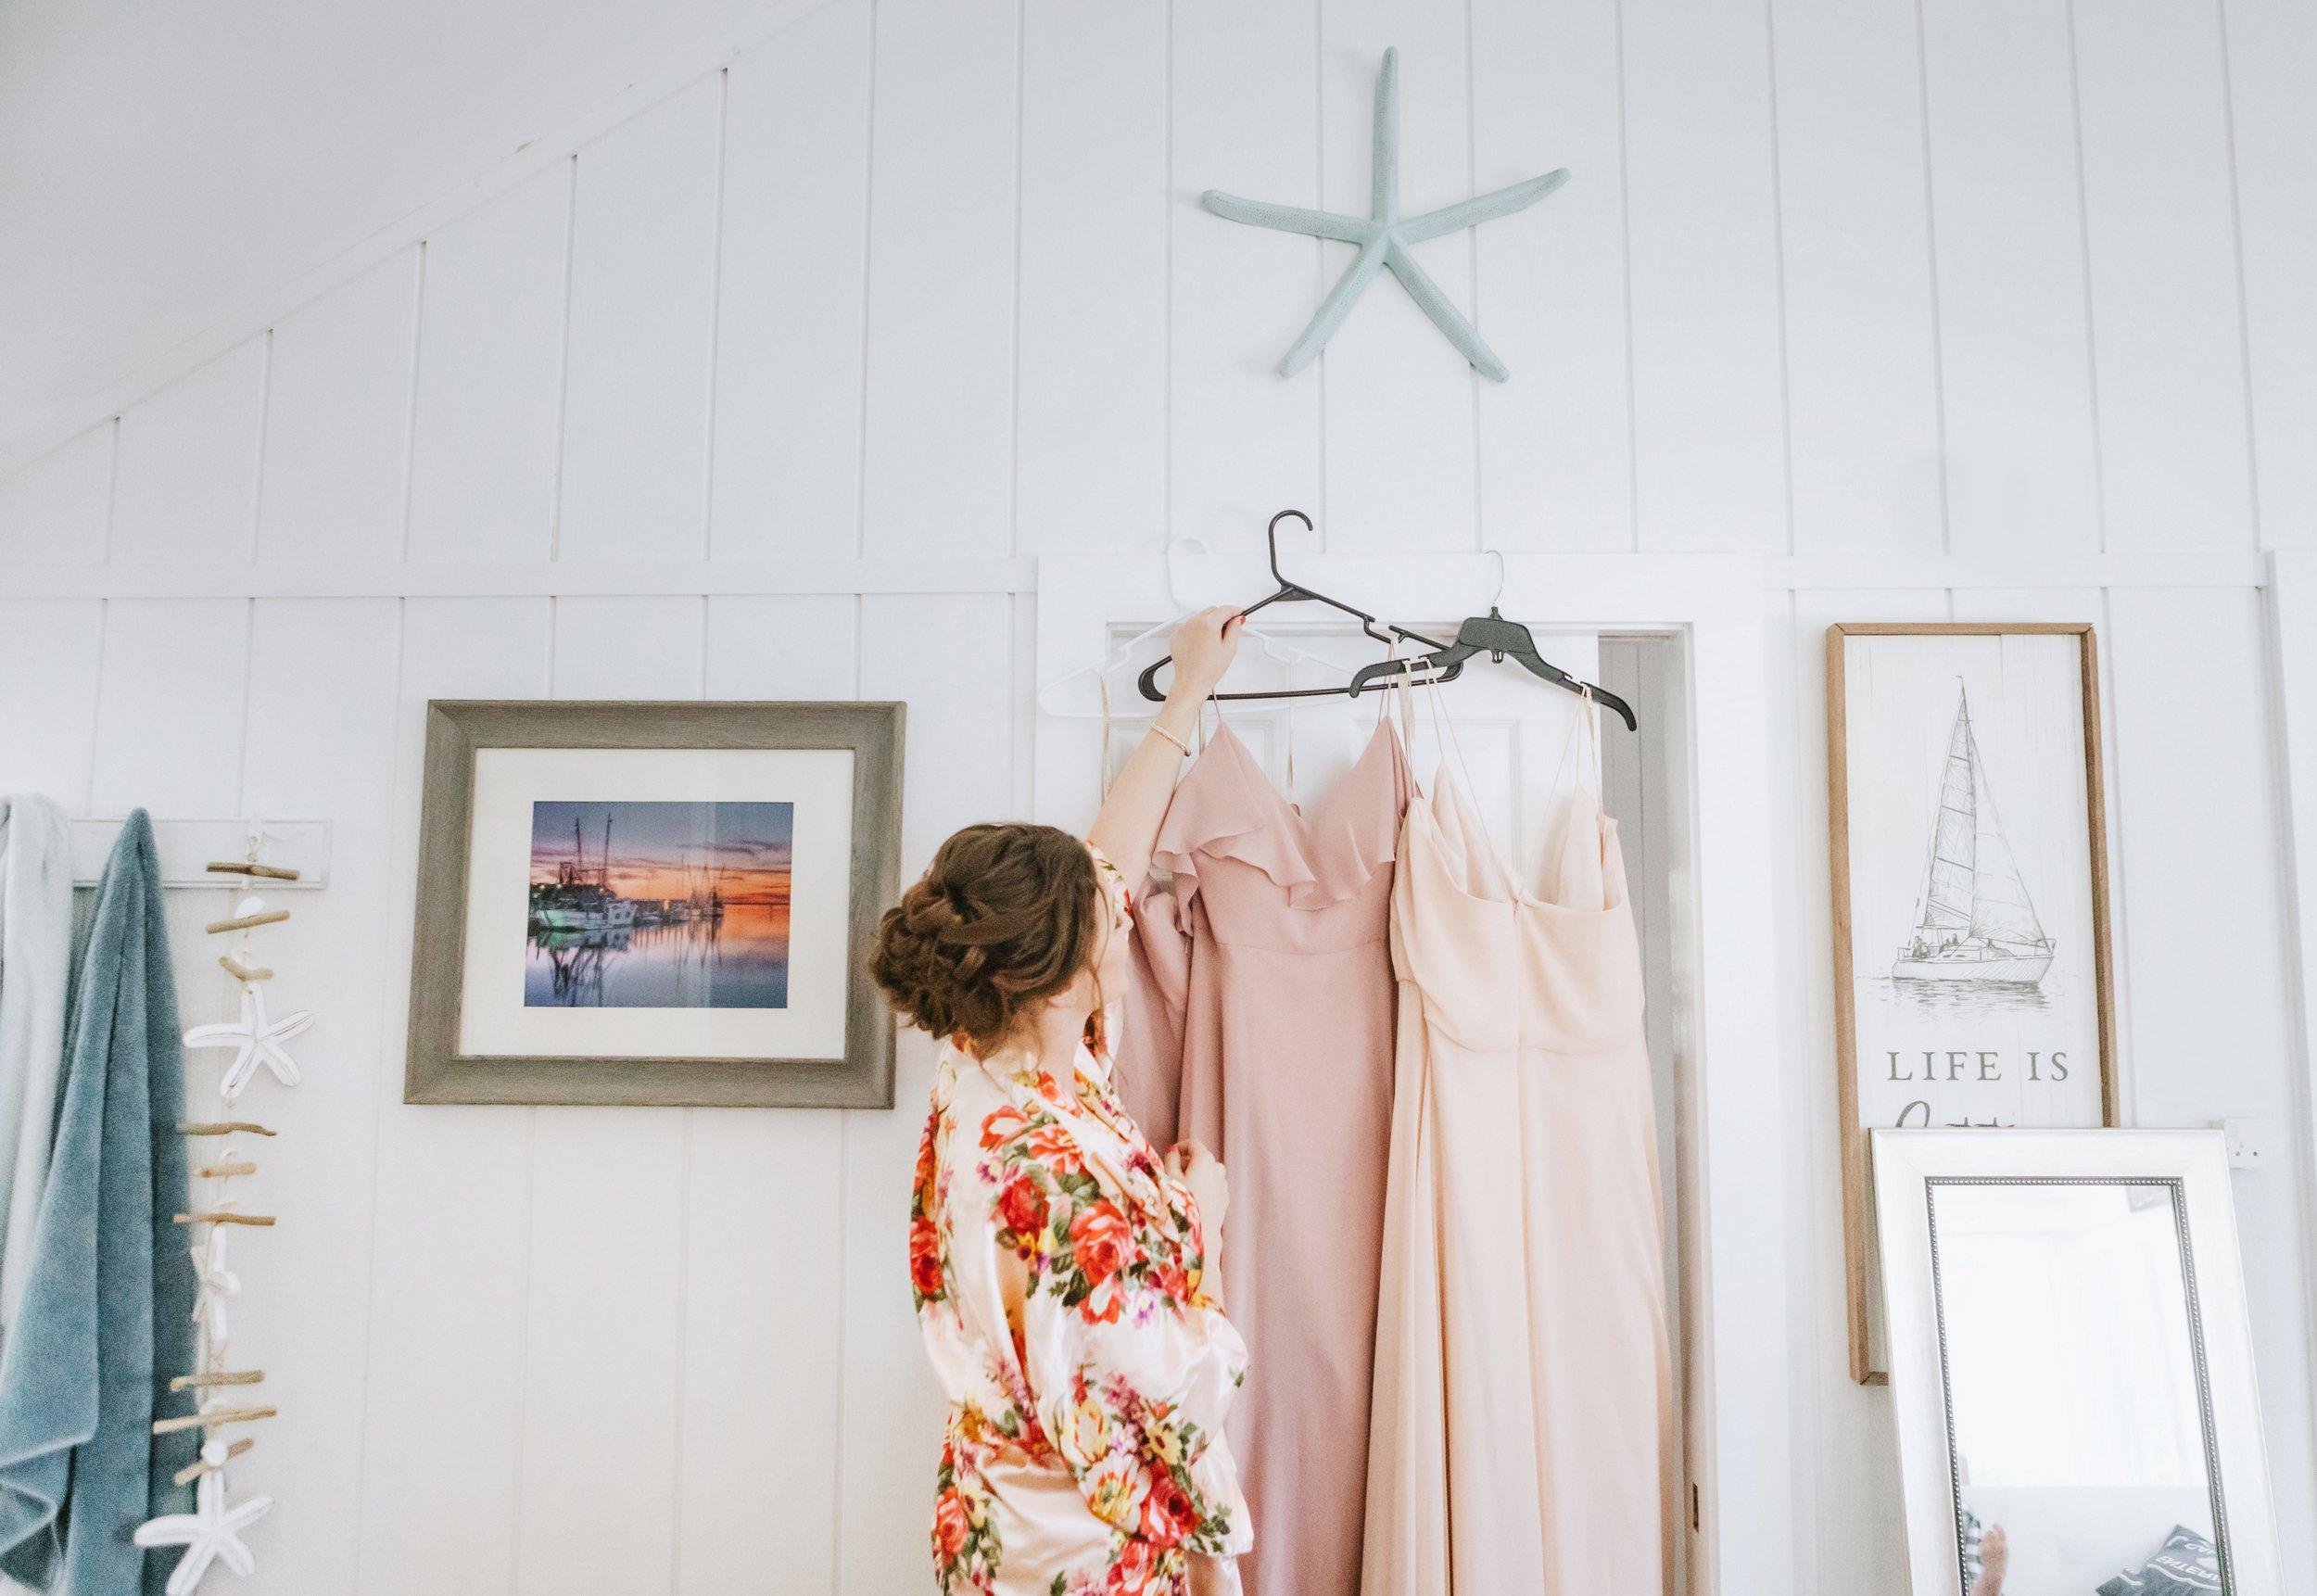 Popponesset-Inn-Wedding-Cape-Cod-Lena-Mirisola-Photography-6.jpg